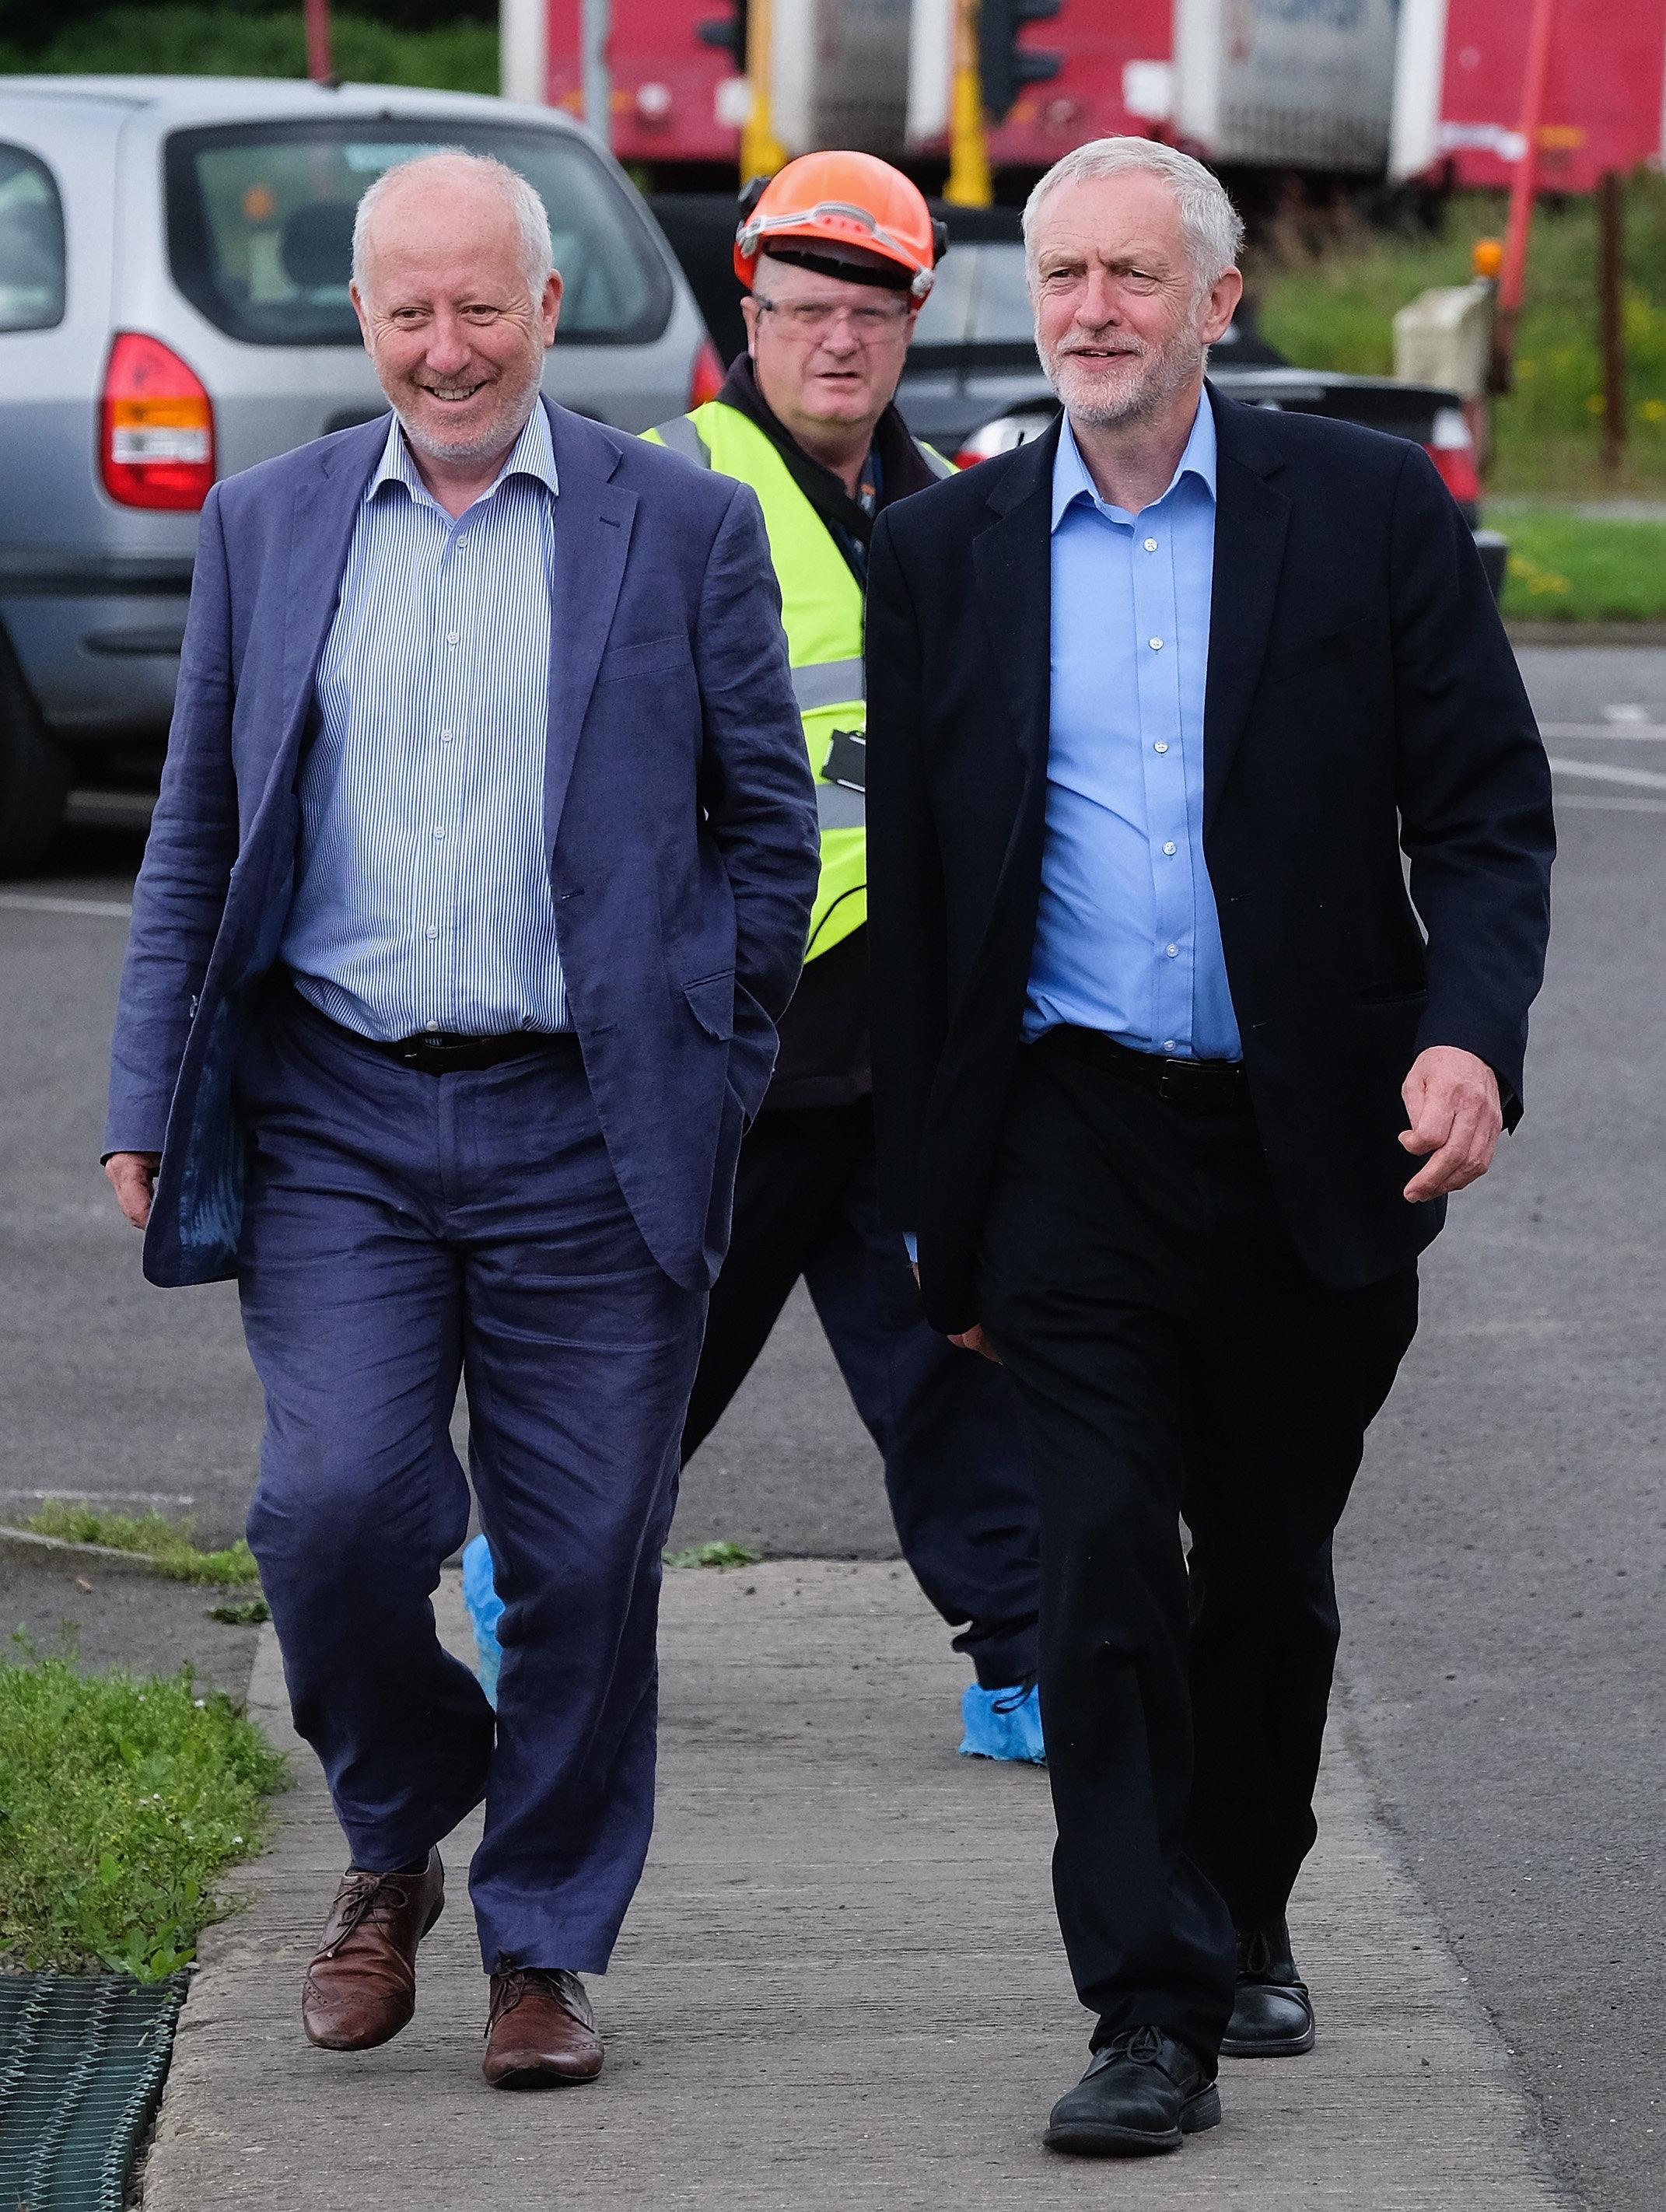 Jeremy Corbyn (R) and Shadow Transport SecretaryAndy